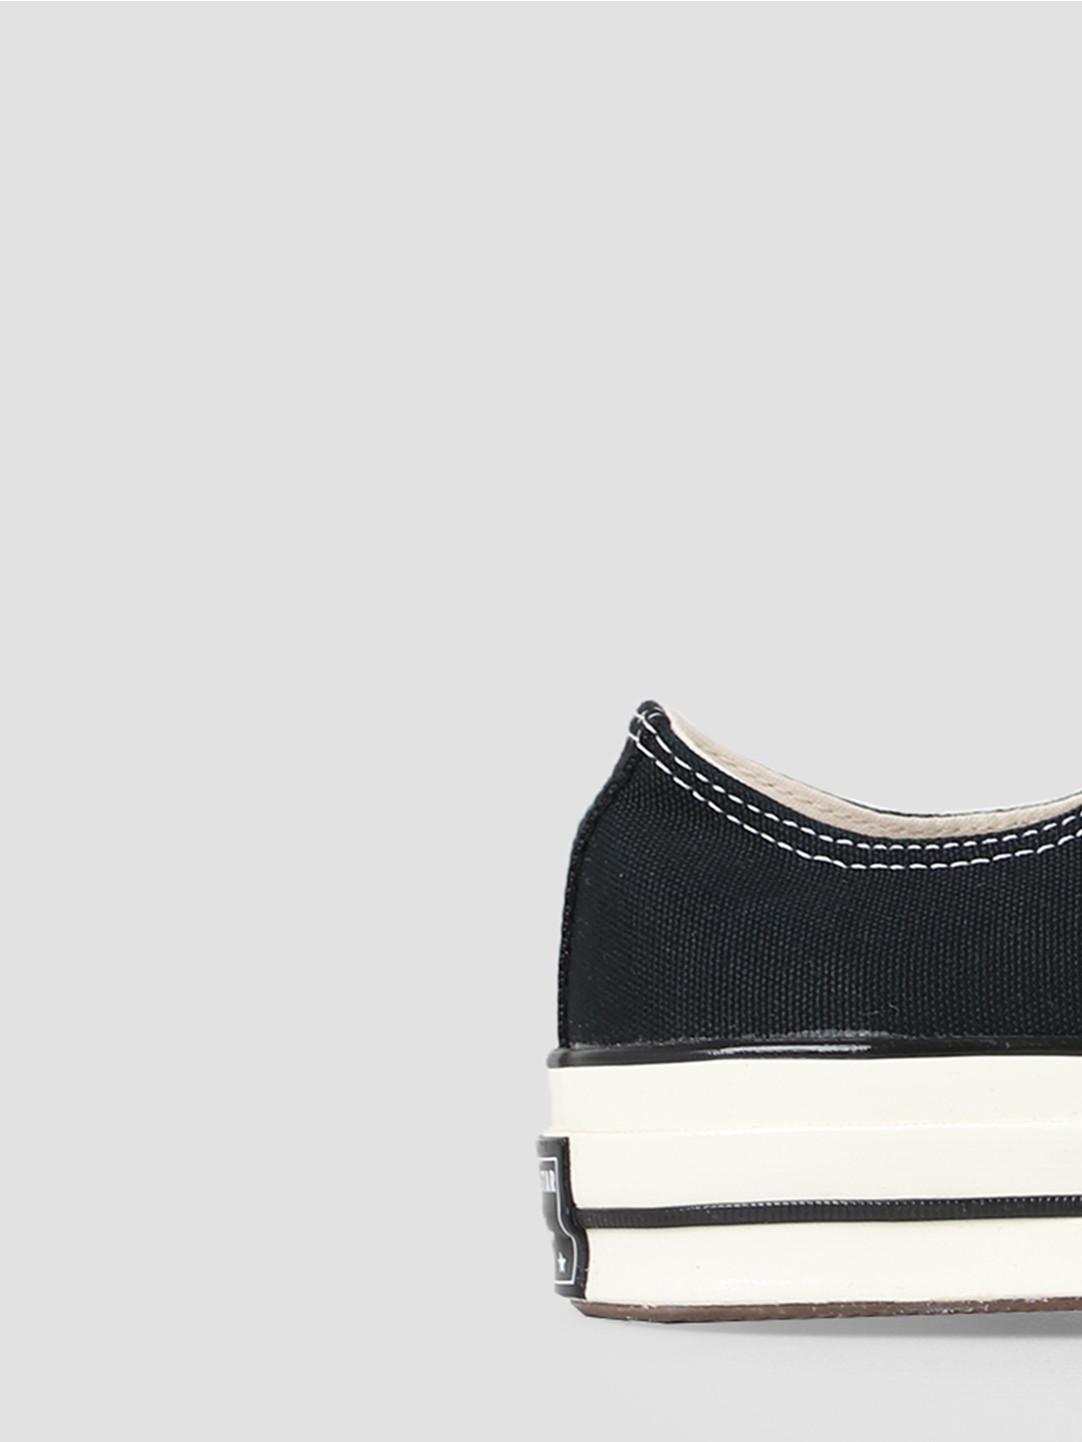 Converse Converse Chuck 70 OX Black Black Egret 162058C